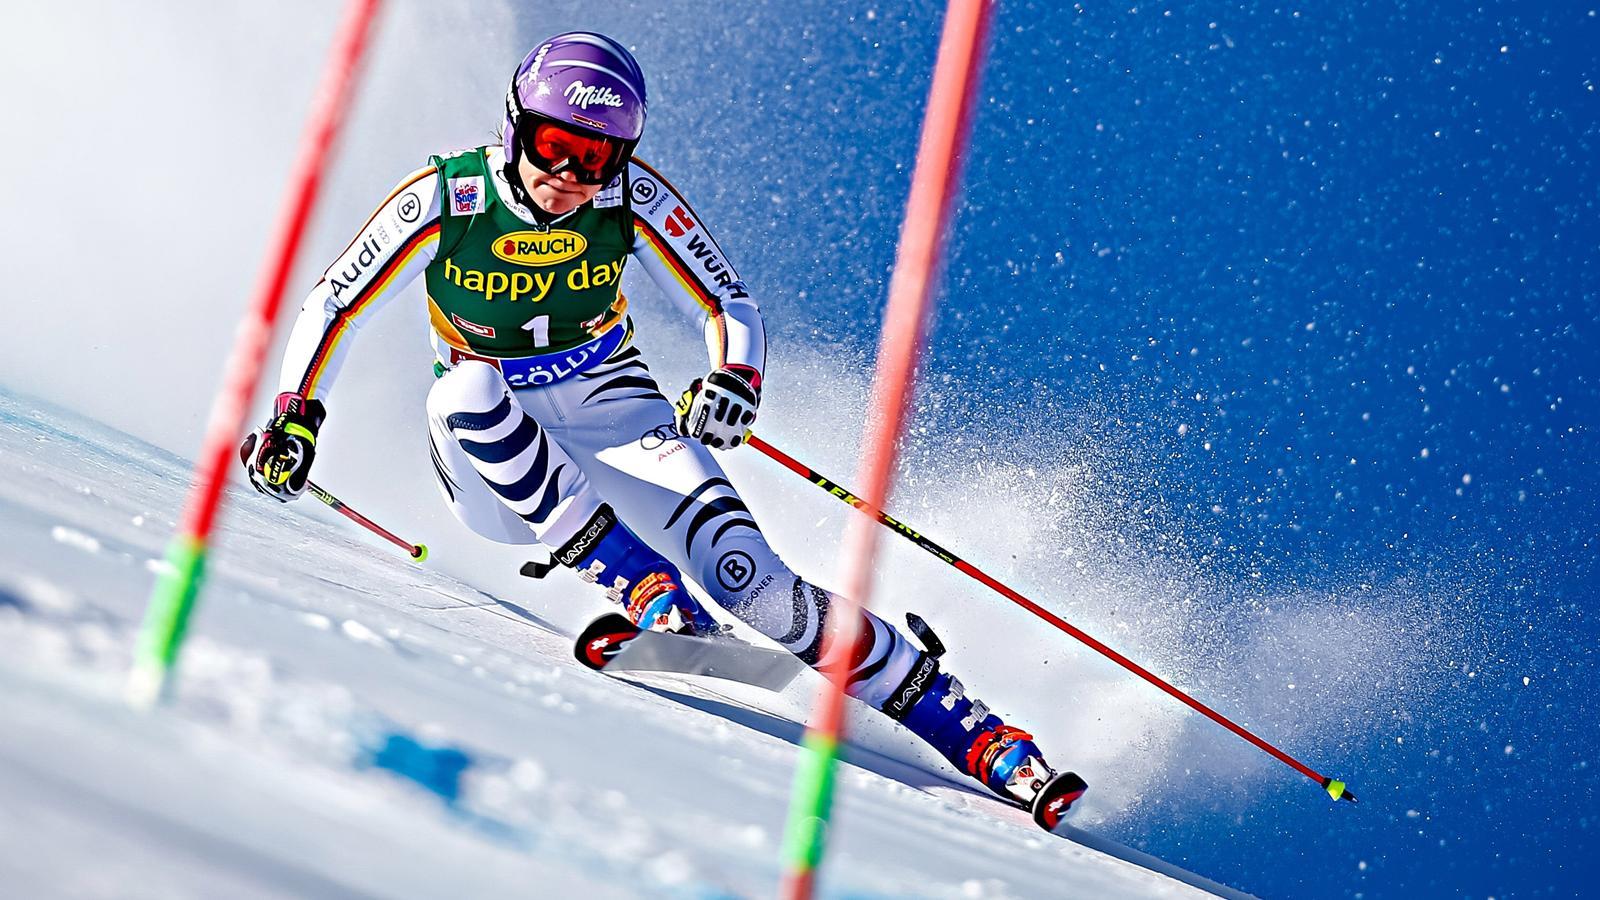 Rebensburg takes gold in opening giant slalom World Cup of season - Alpine Skiing - Eurosport